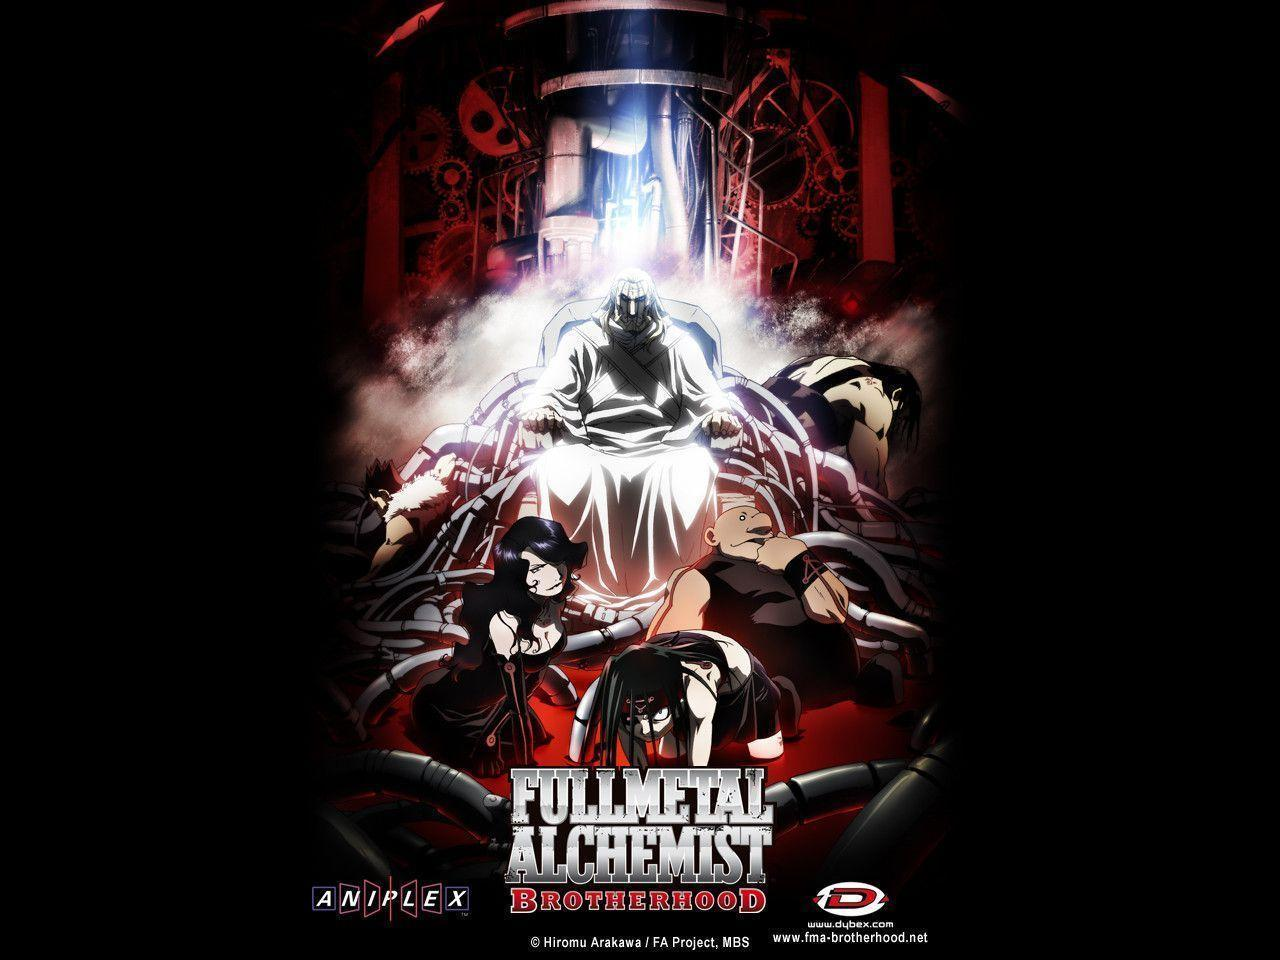 fullmetal alchemist brotherhood wallpapers - photo #36